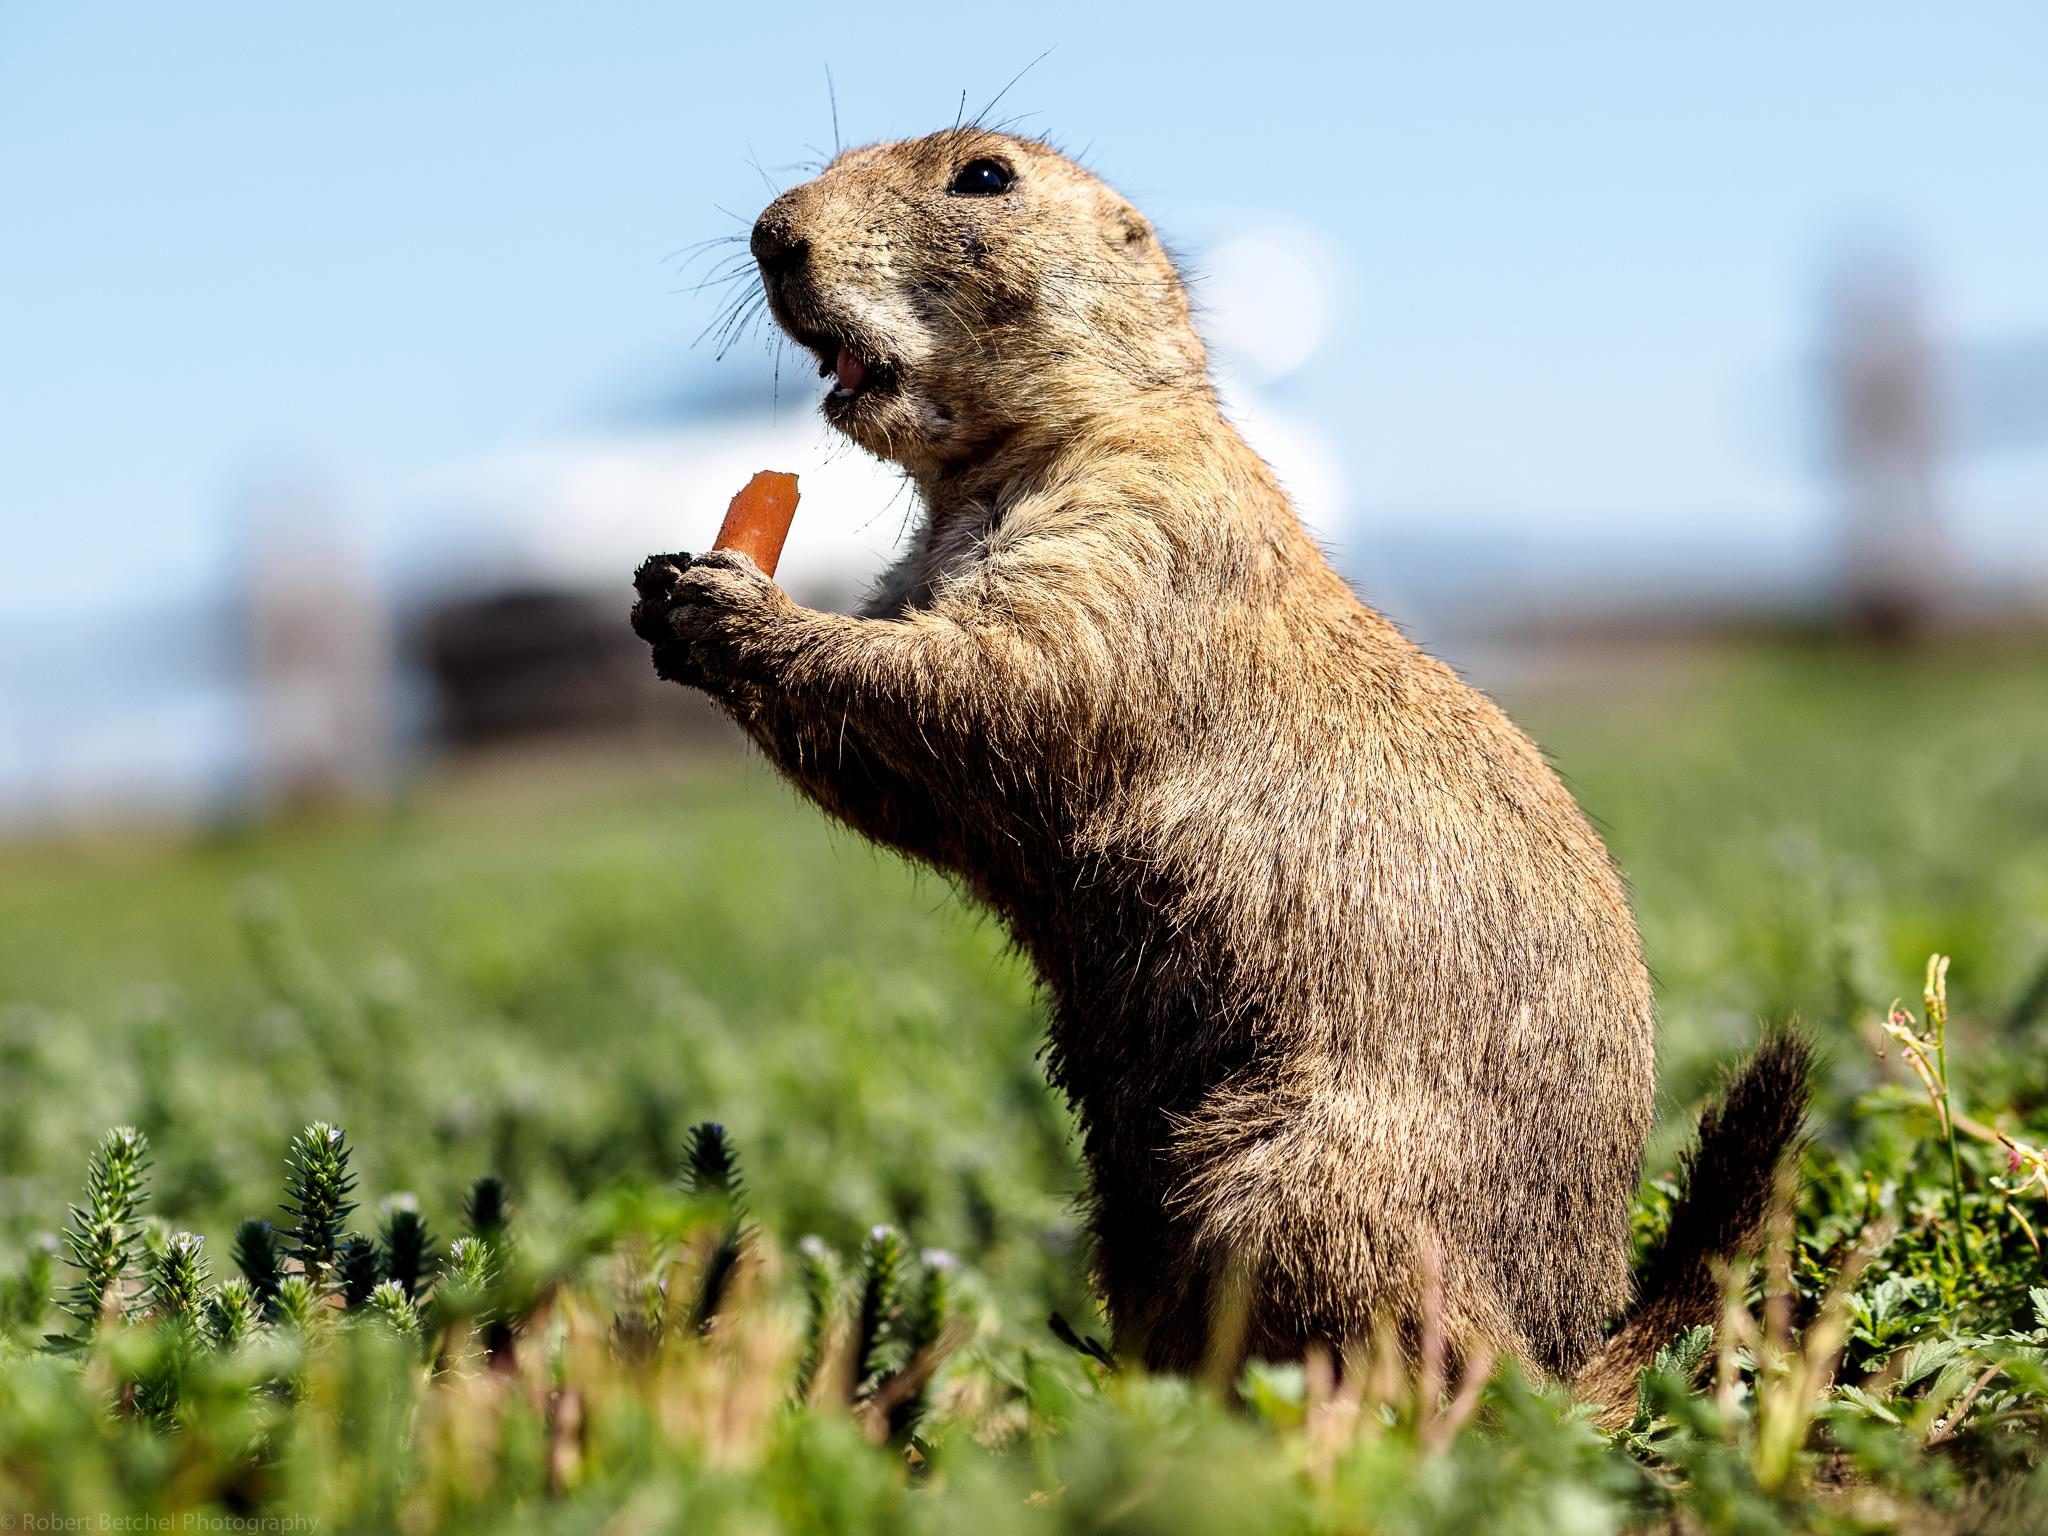 Prairie dog enjoying a snack at Wichita Mountains Wildlife Refuge. Photo by Betchel Photography of Edmond